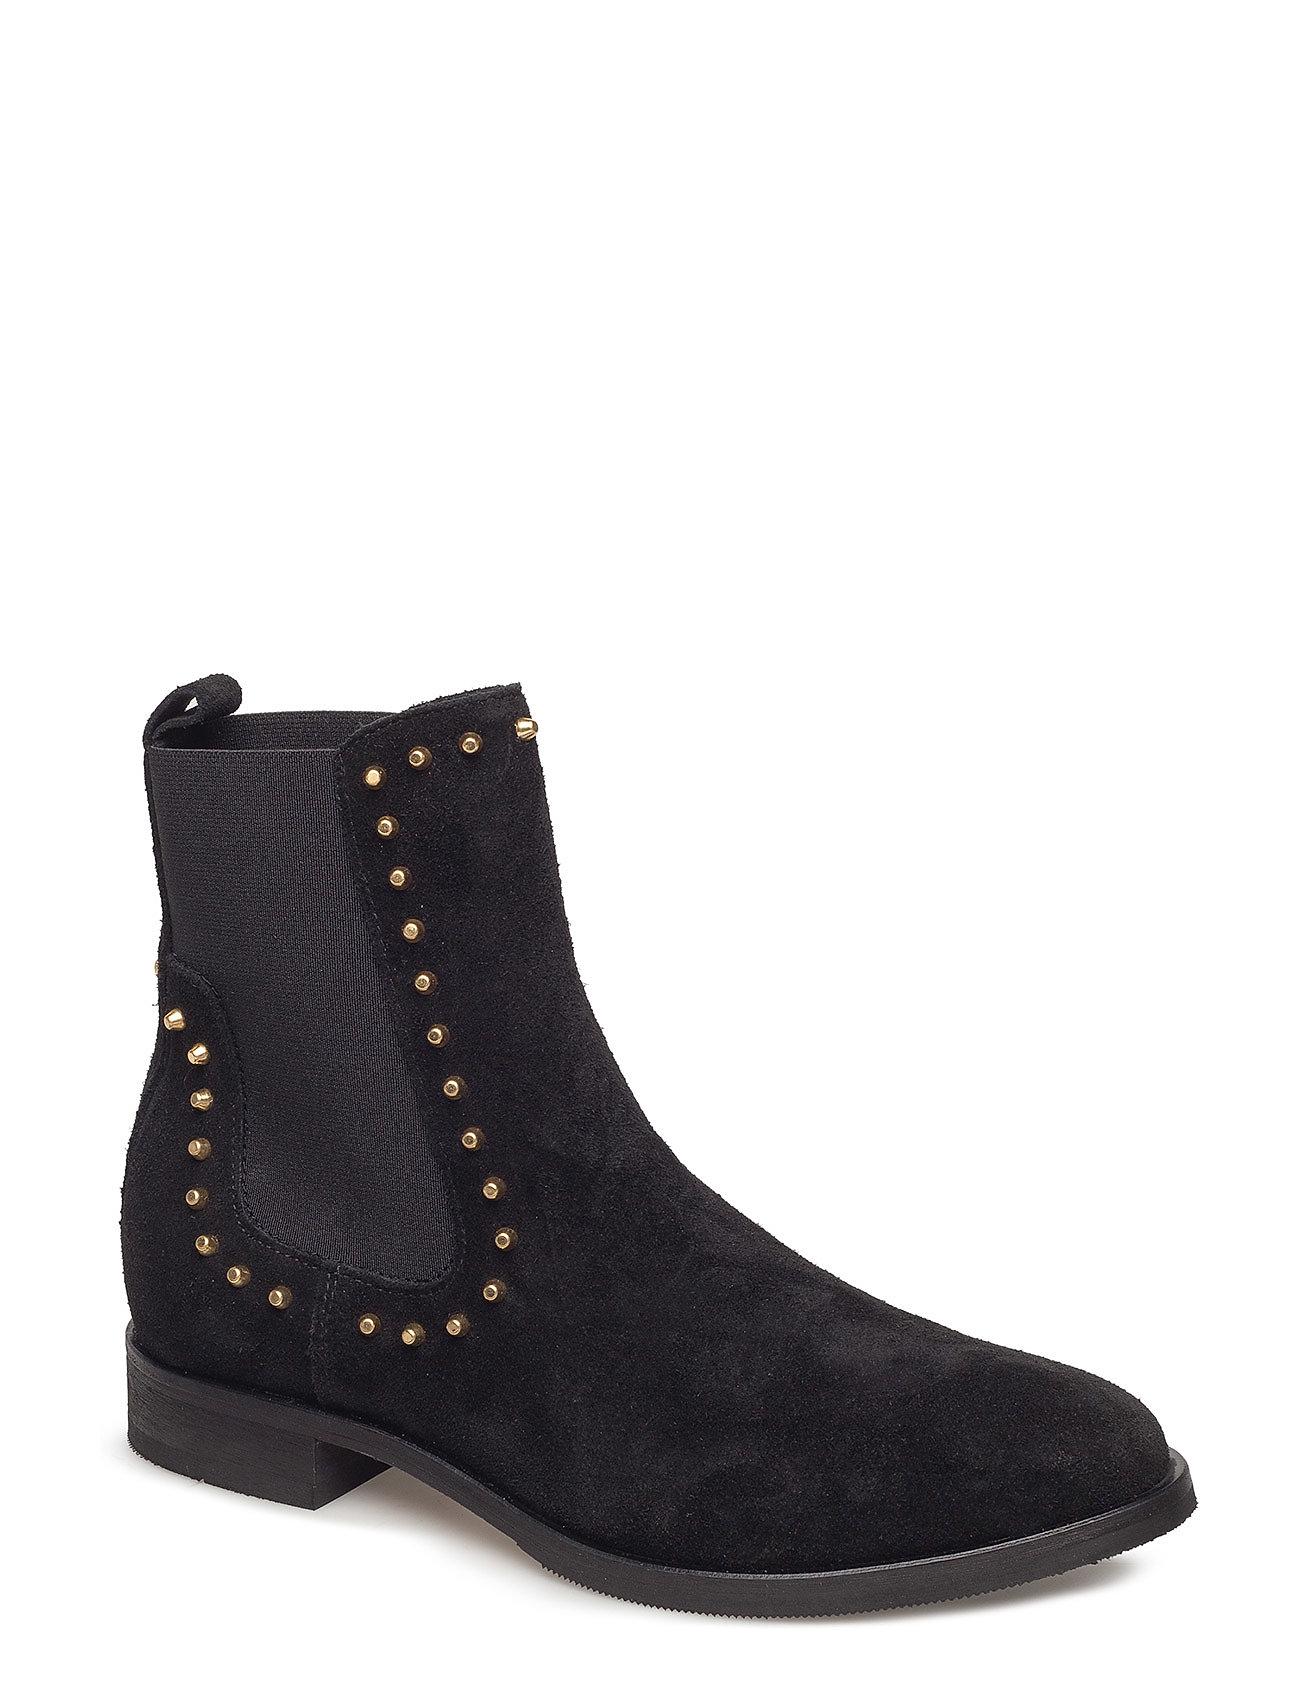 db691ab669f Shoe The Bear chelsea boots – Marla Studs til dame i Sort - Pashion.dk